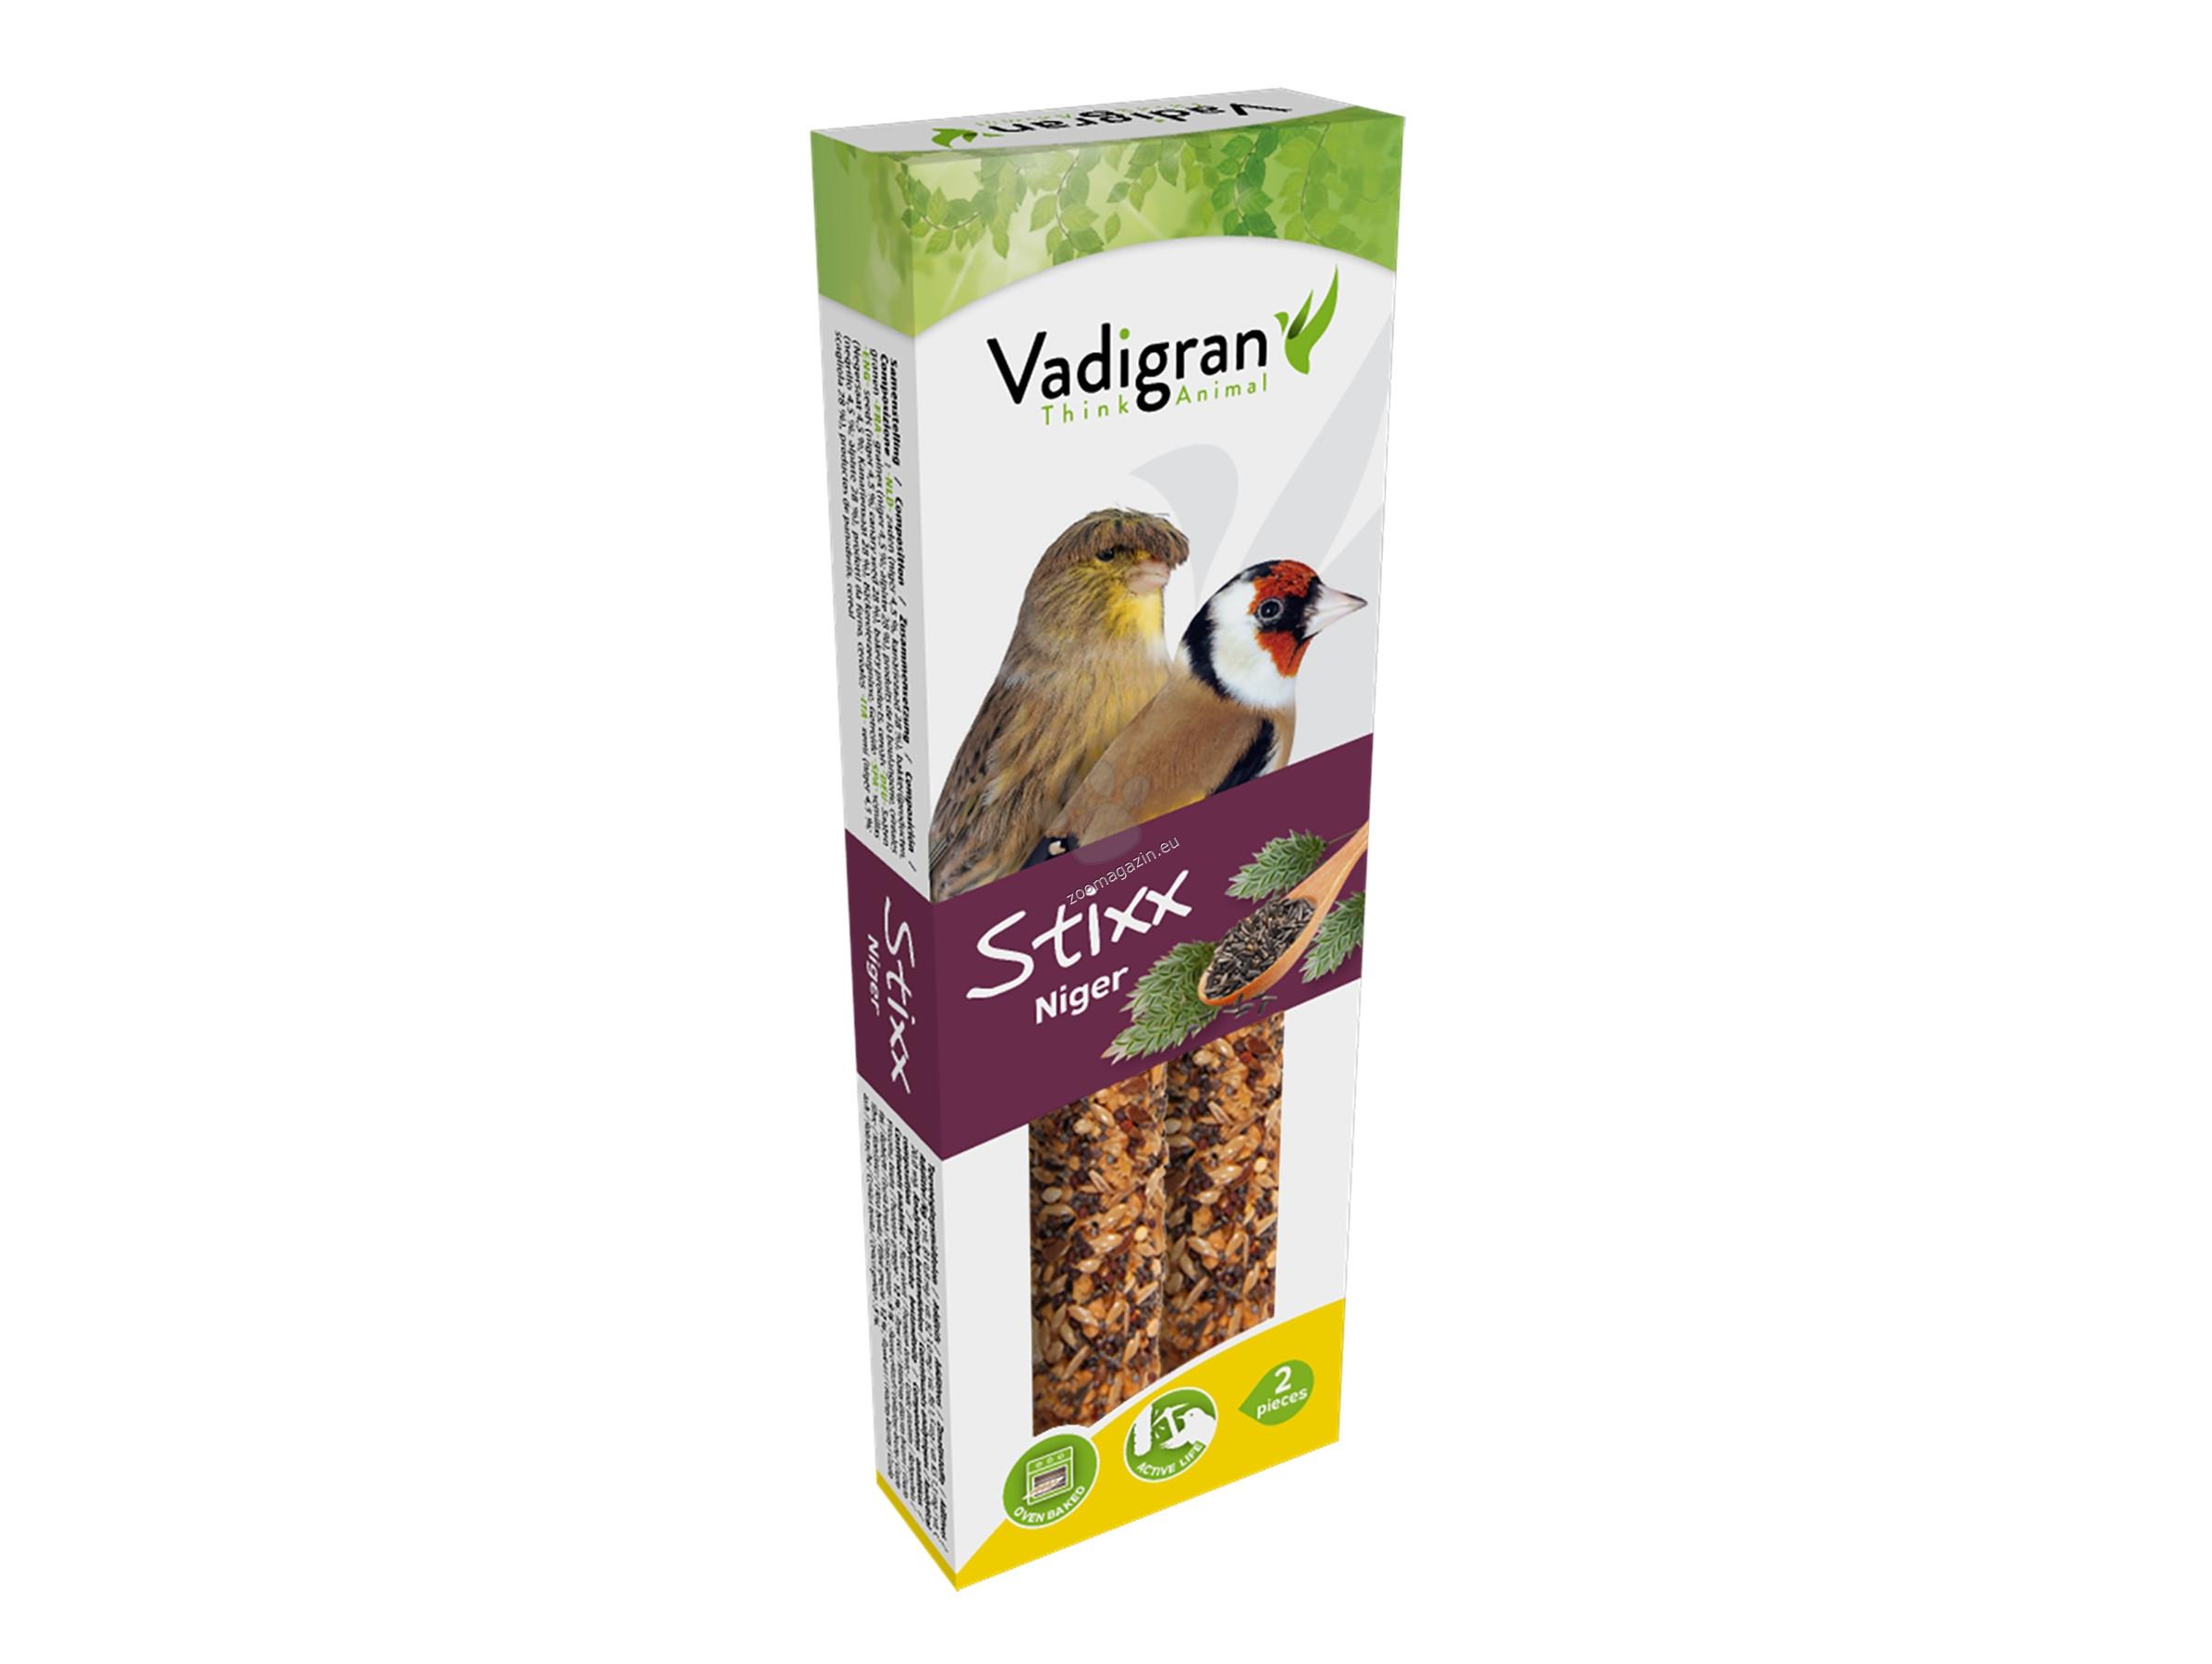 Vadigran Snack StixX eurofinch&canarie niger - крекер с нигер 85 гр., 2 броя